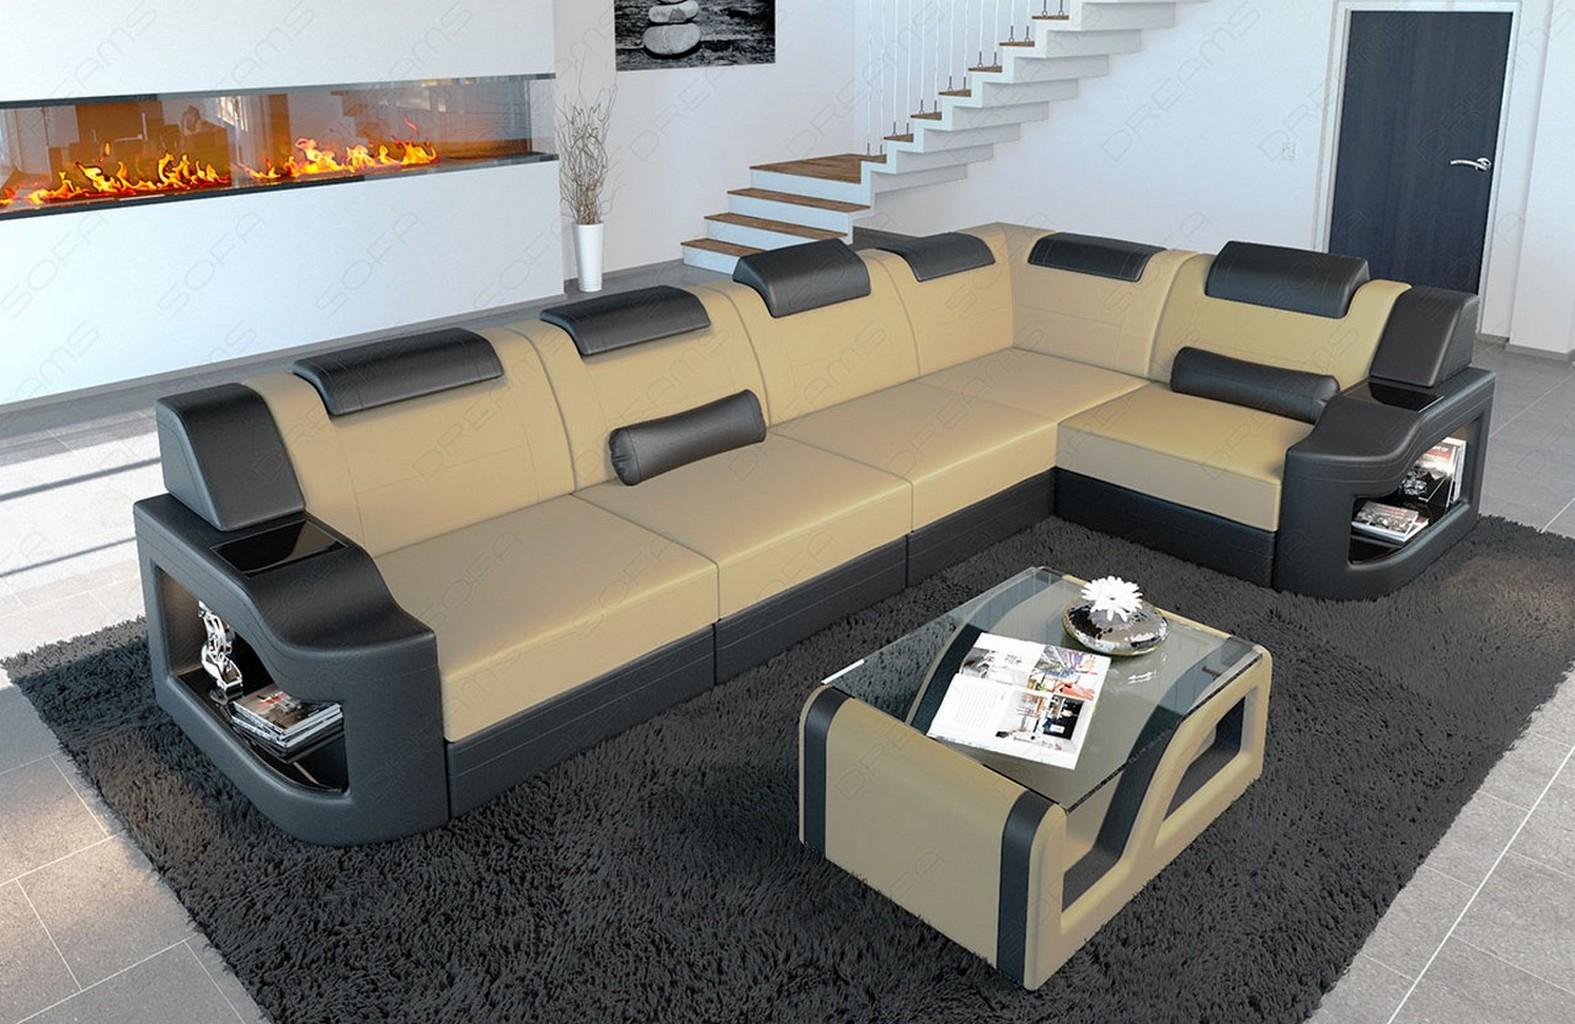 Fabric Sectional Sofa Manhattan L Shape Designer Couch ...